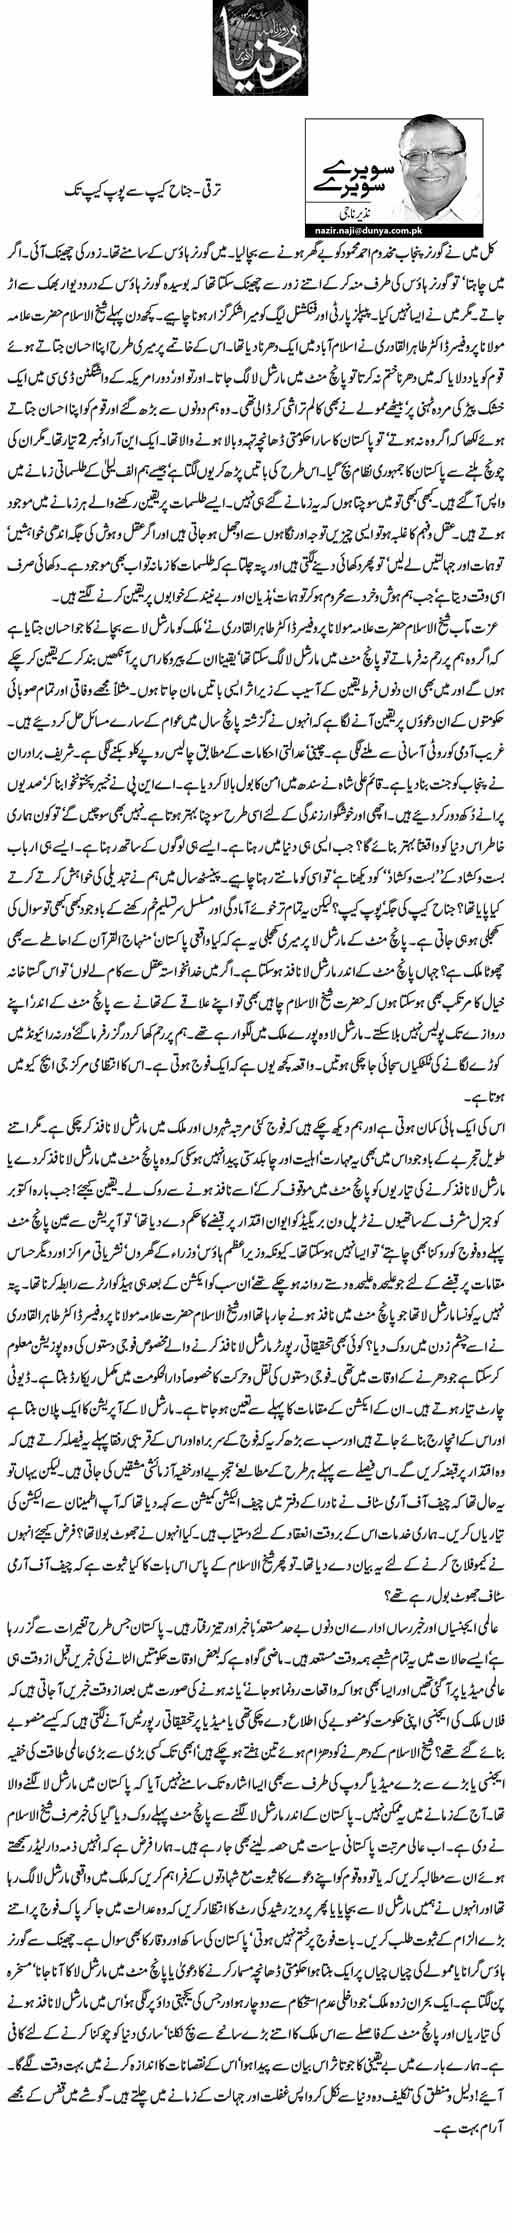 Tarakki-Jinnah cap se pop cap tak - Nazeer Naji